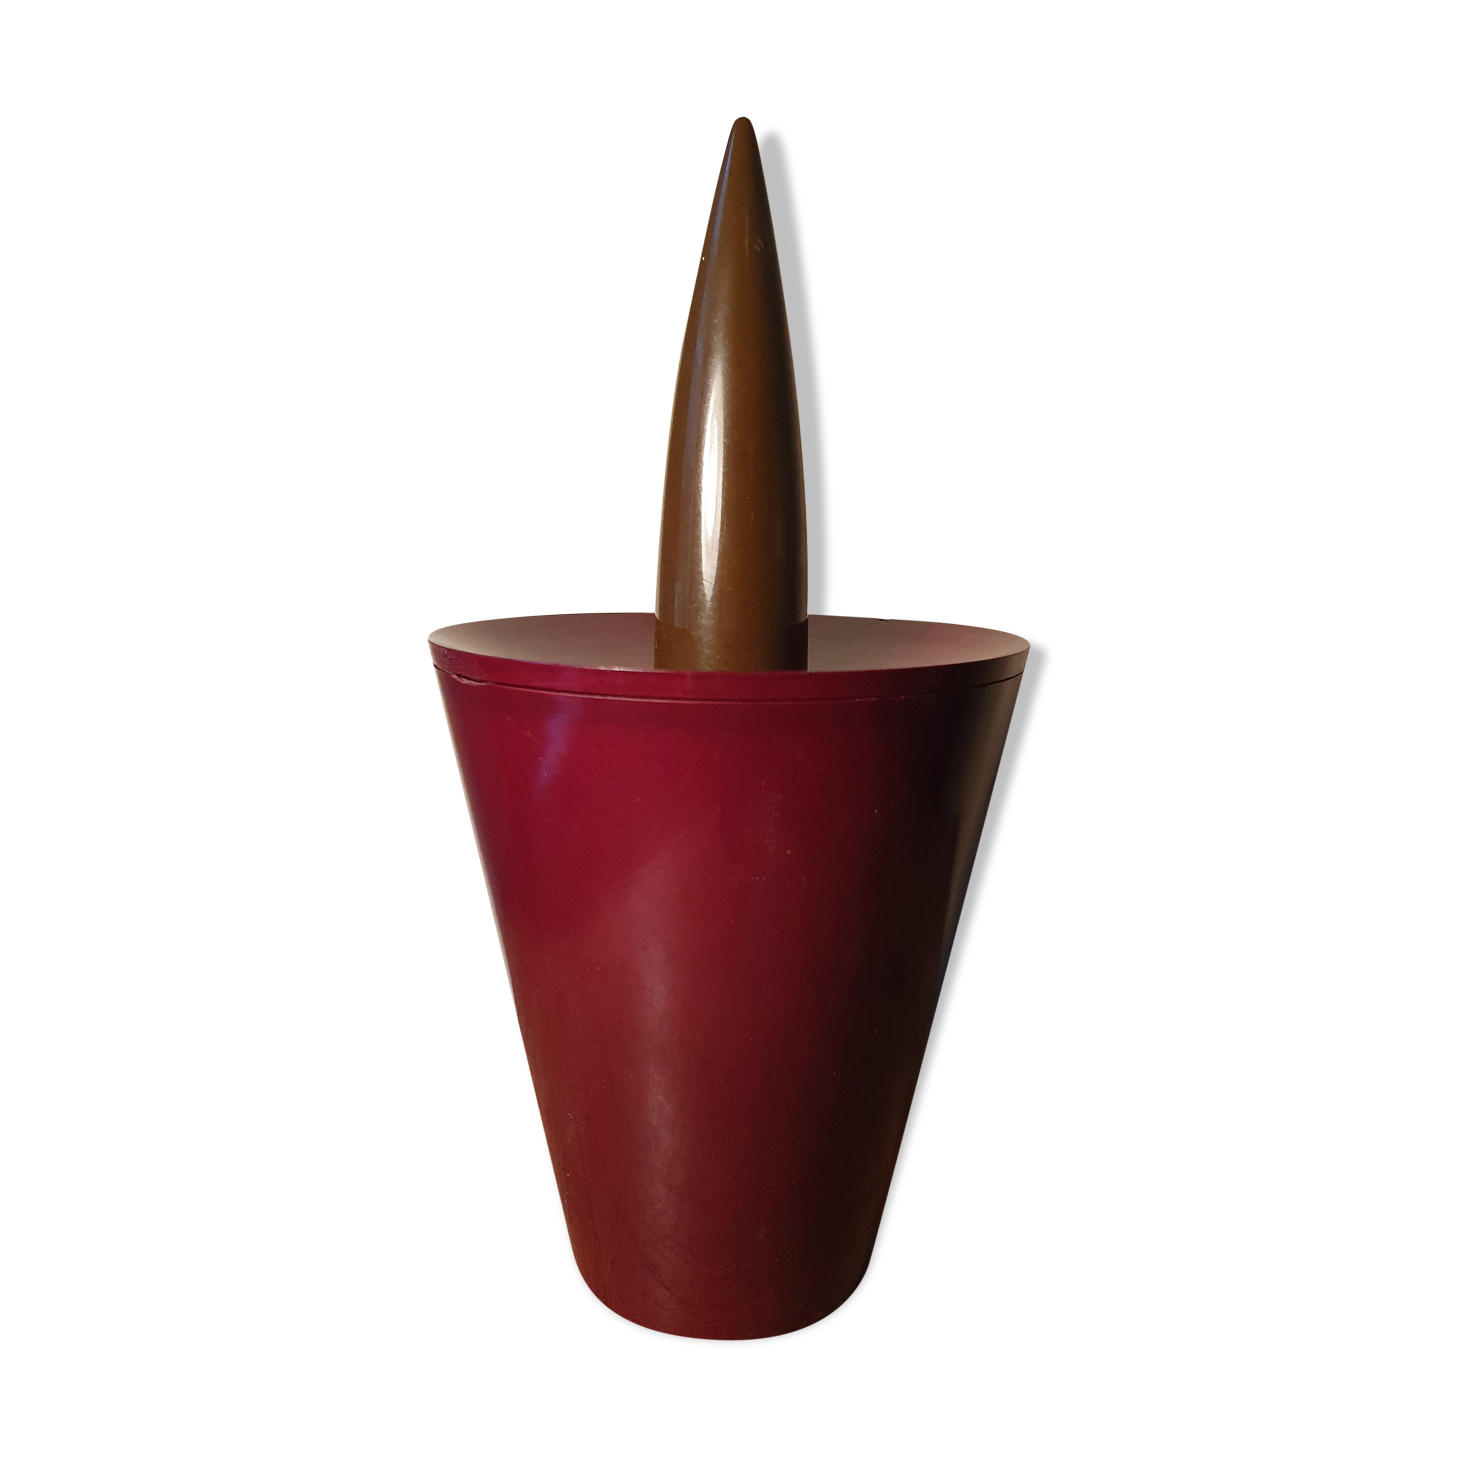 Cendrier en bakélite Joe Cactus de Philippe Starck